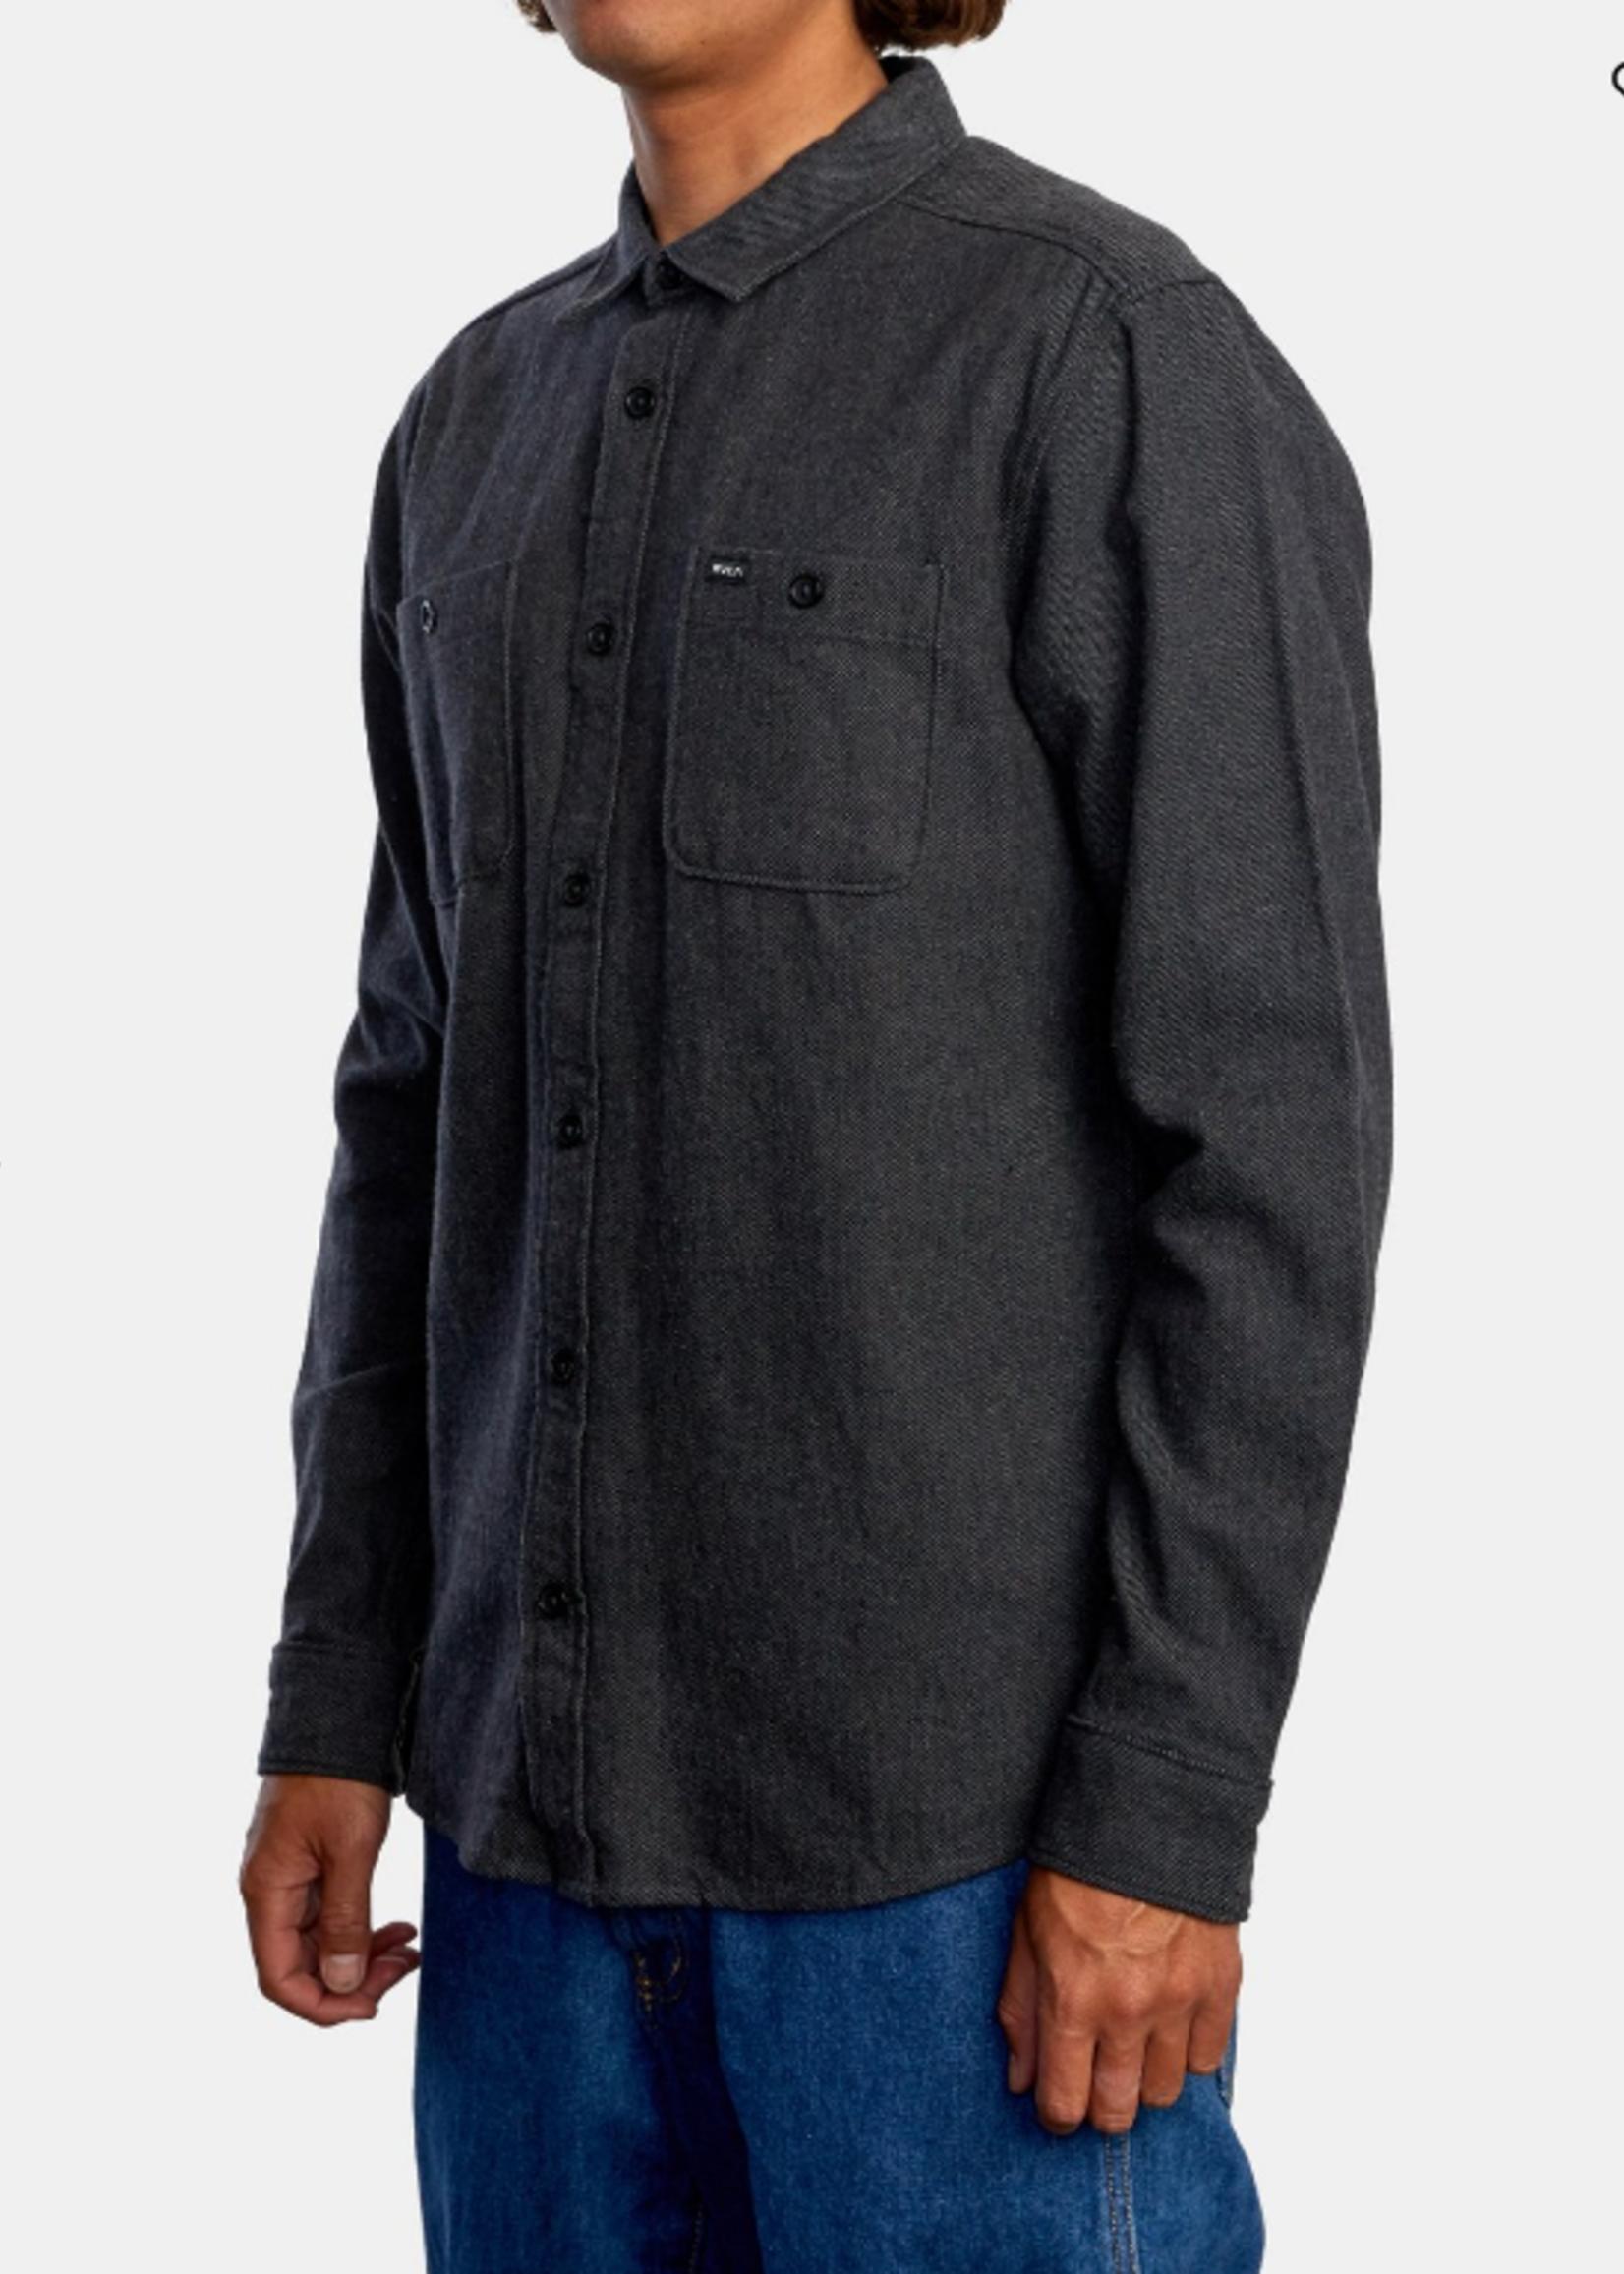 RVCA Harvest Flannel - Dark Grey